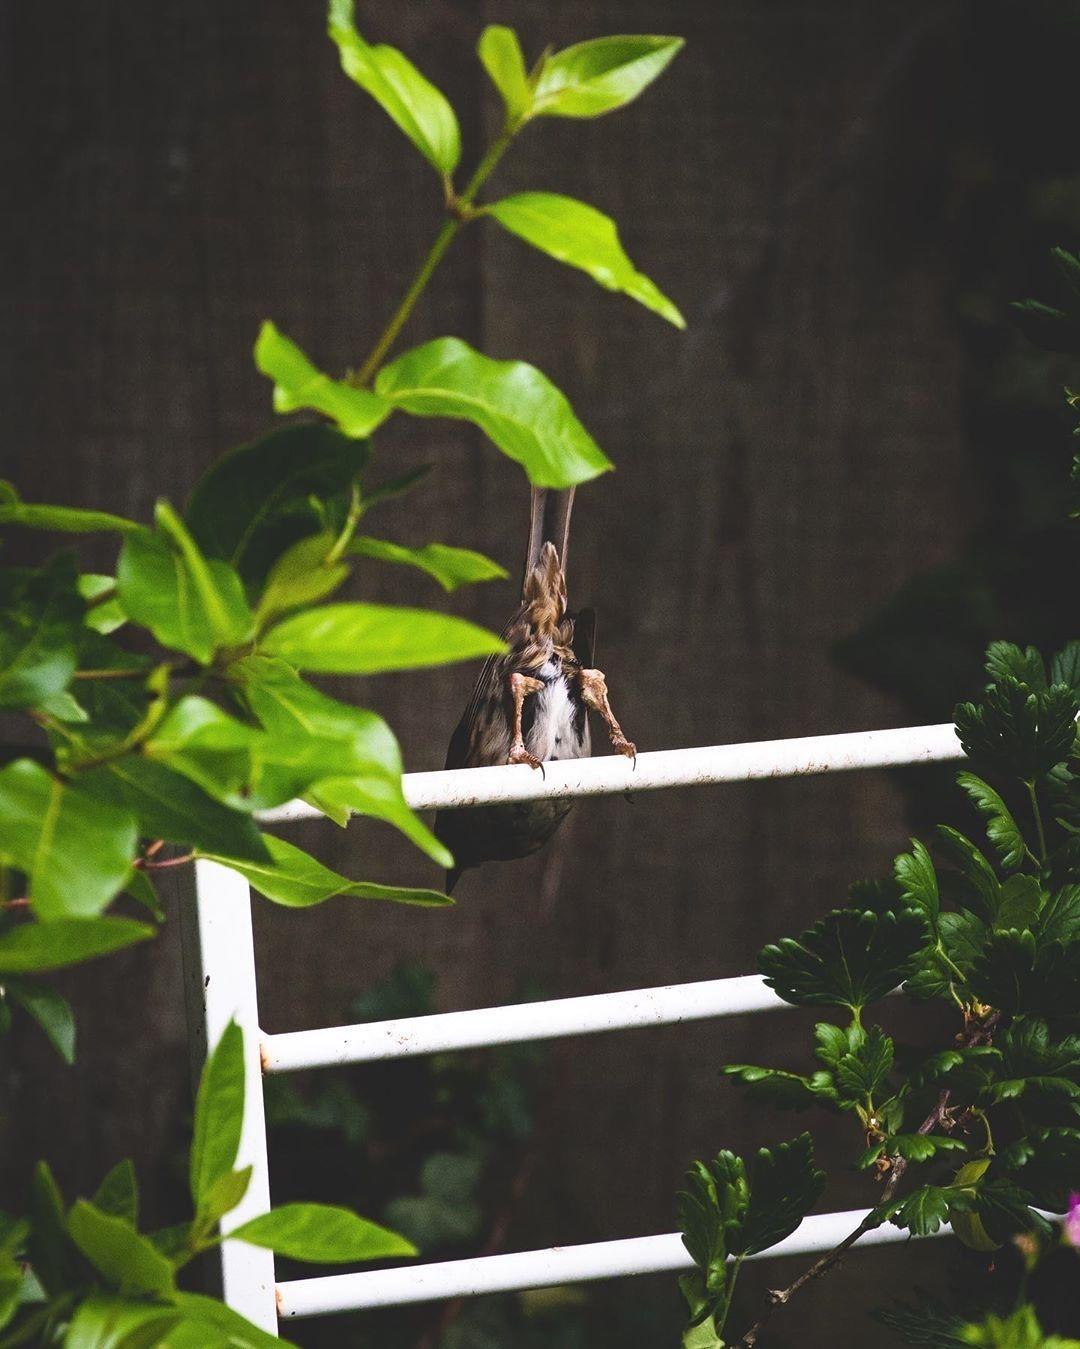 Lovely... thanks for that 😂 #bird #birdphotography #photo #photography #canonphotography #canonphotography